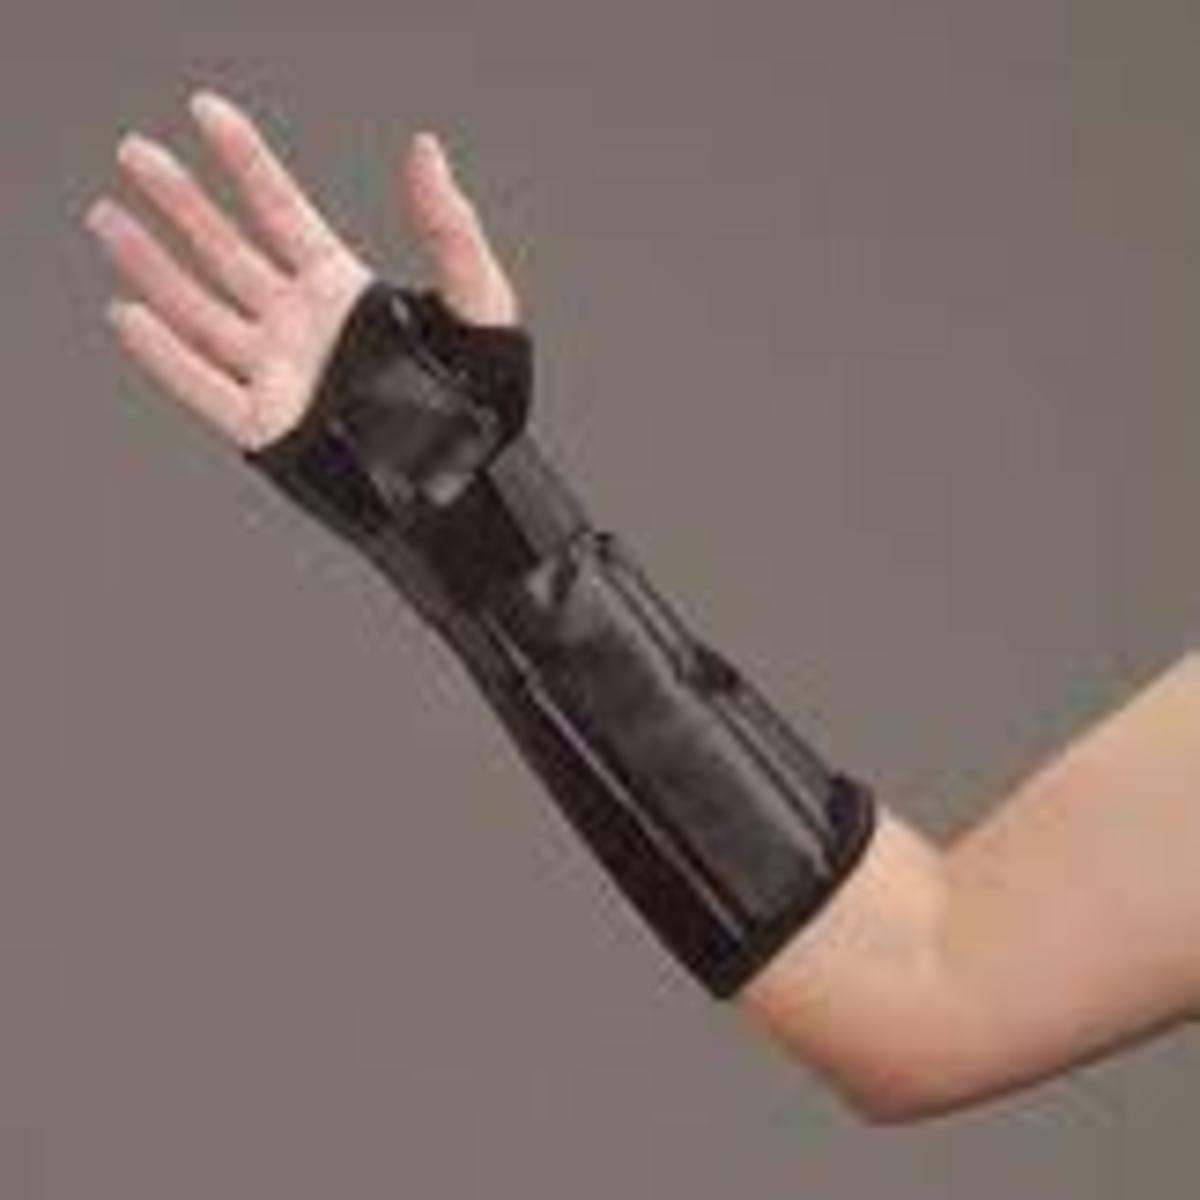 Distal radius fracture splint for immobilization of radius bone of wrist